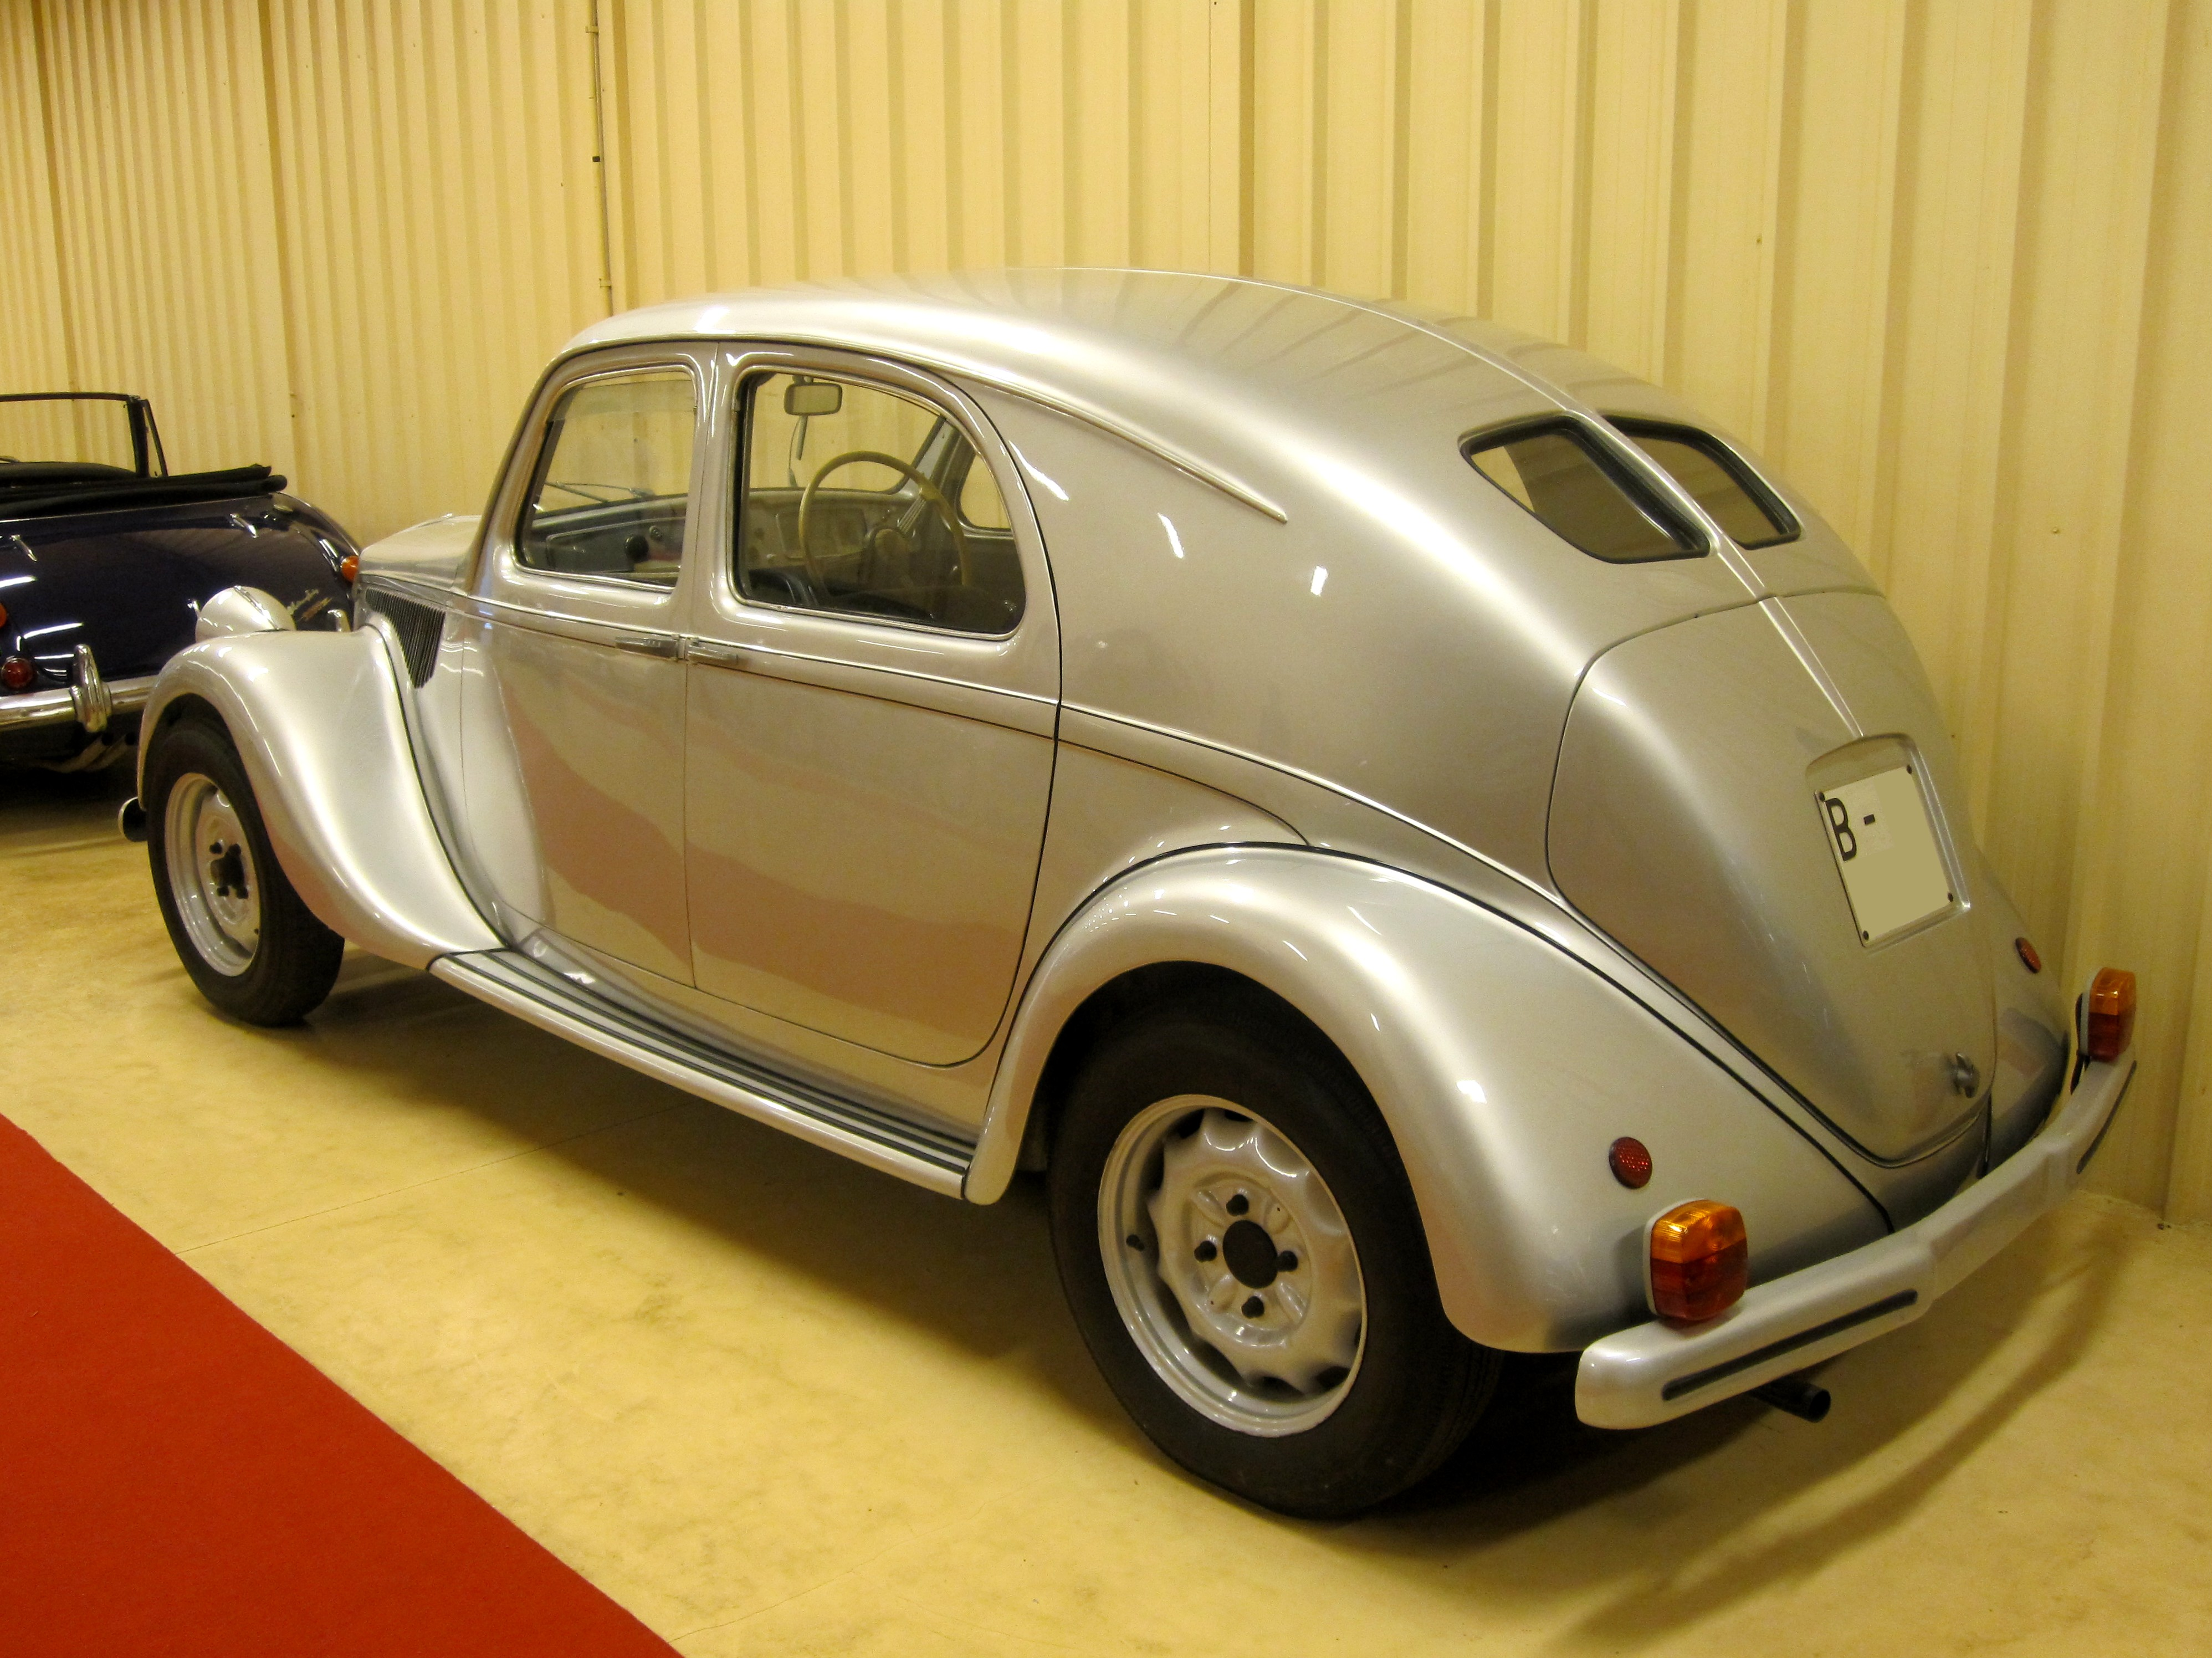 https://upload.wikimedia.org/wikipedia/commons/2/21/1939_Lancia_Aprilia_%284773642255%29.jpg